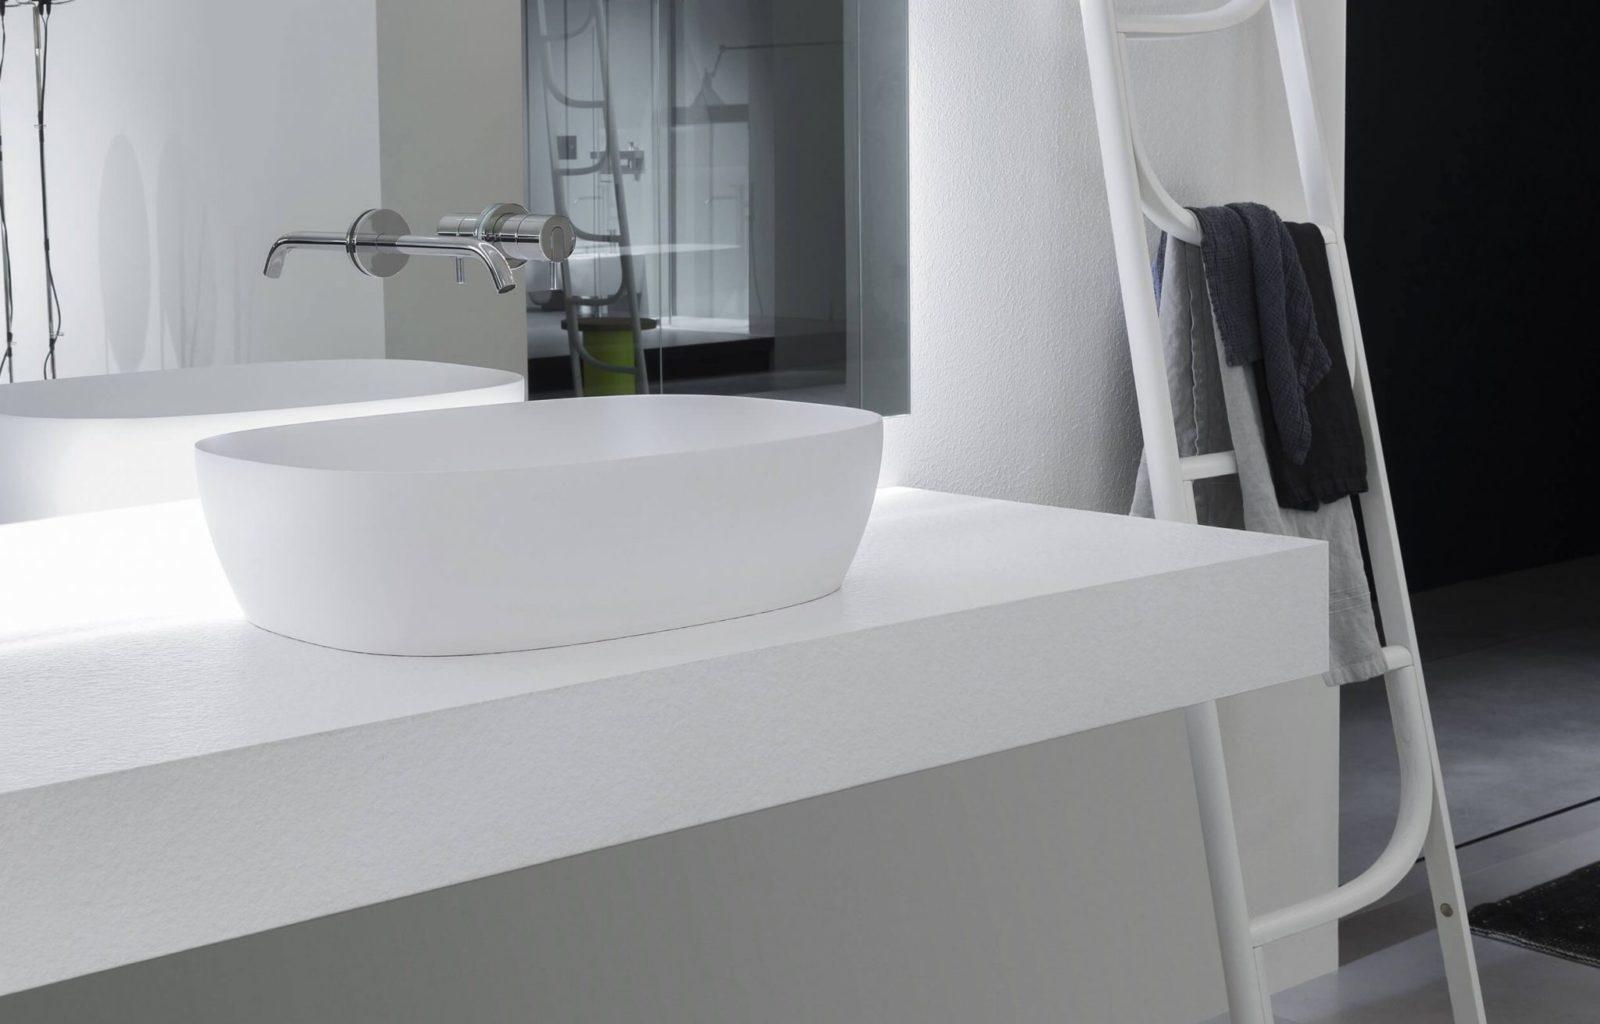 Senso Аntonio Lupi Раковина прямоугольная из материала Flumood, для установки на столешницу 40x60x15 см